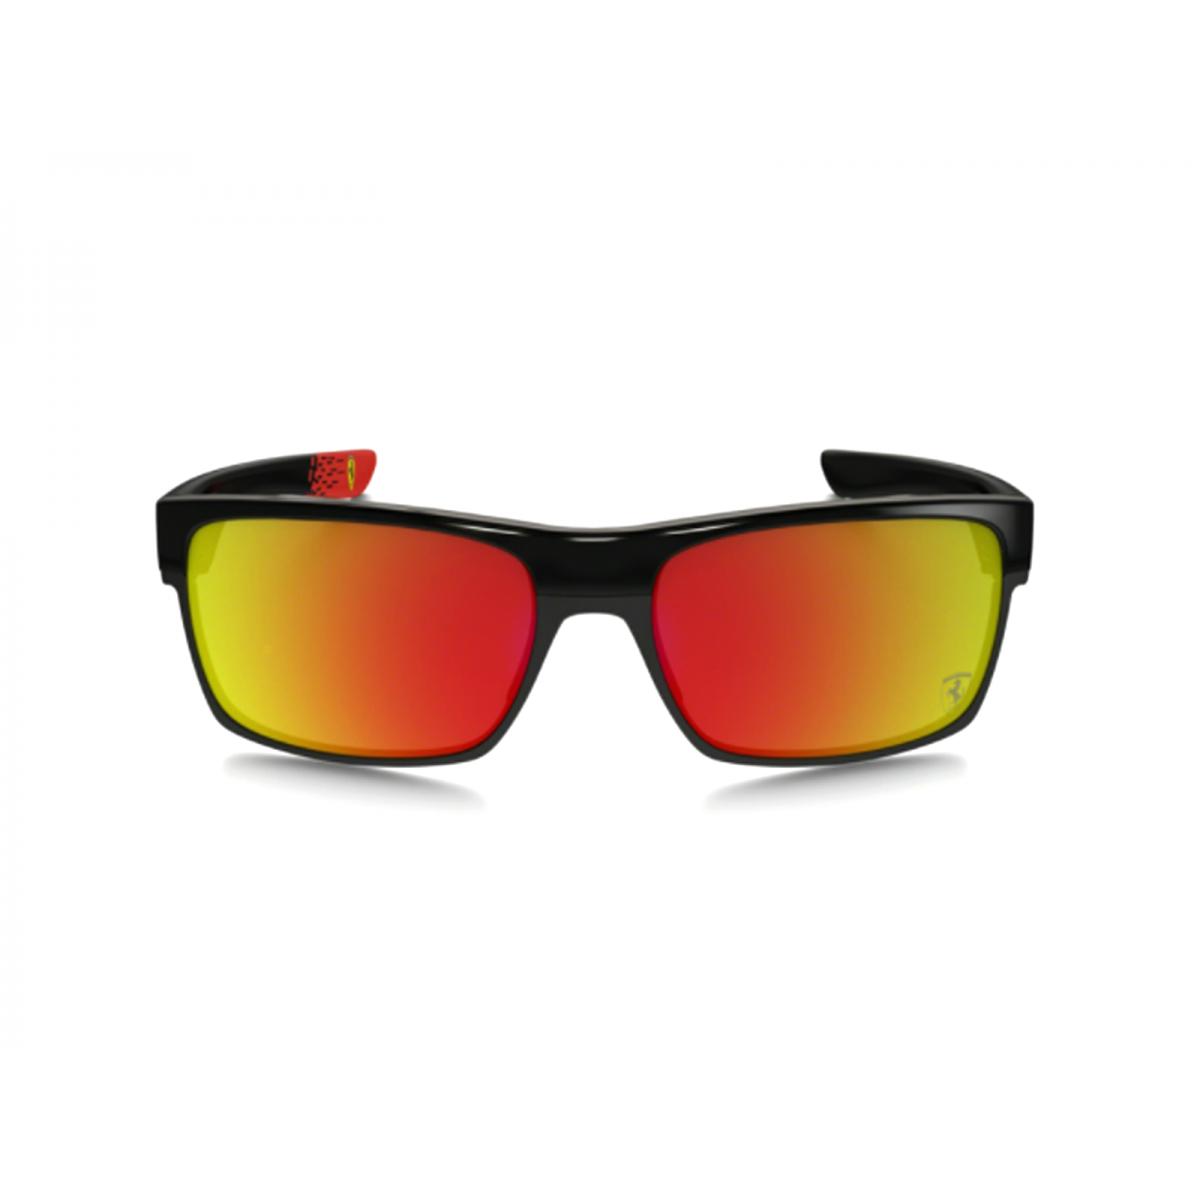 a55f3ba1dc9af Oakley Twoface Scuderia Ferrari Ruby Iridium Men Sunglasses  OK-9189-918936-60 - Sunglasses - Fashion World